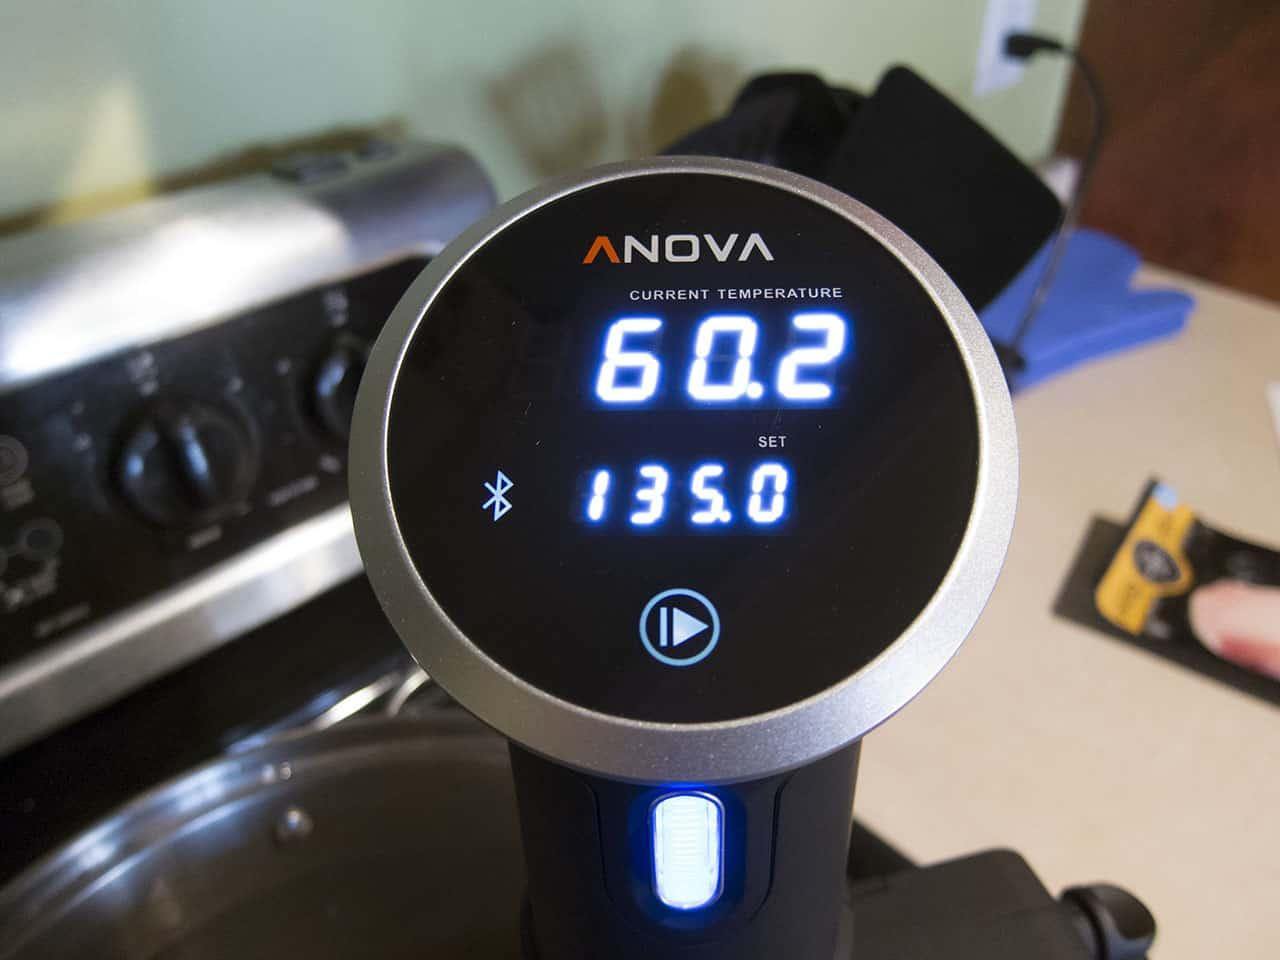 anova-sous-vide-cooker-02